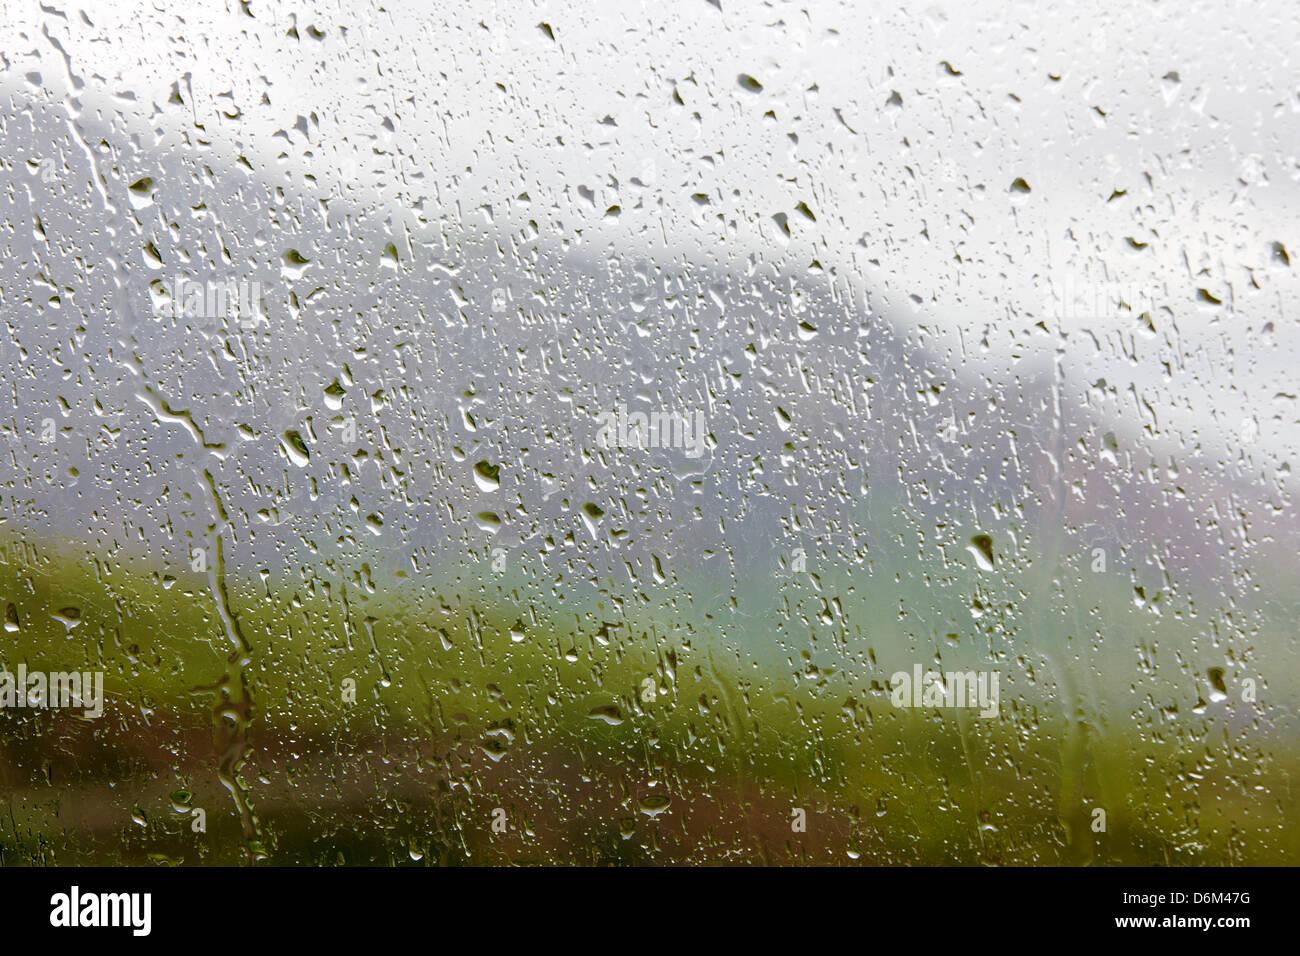 Rainy view south of the Alaska Range through a we car window from Polychrome Pass, Denali National Park, Alaska, - Stock Image